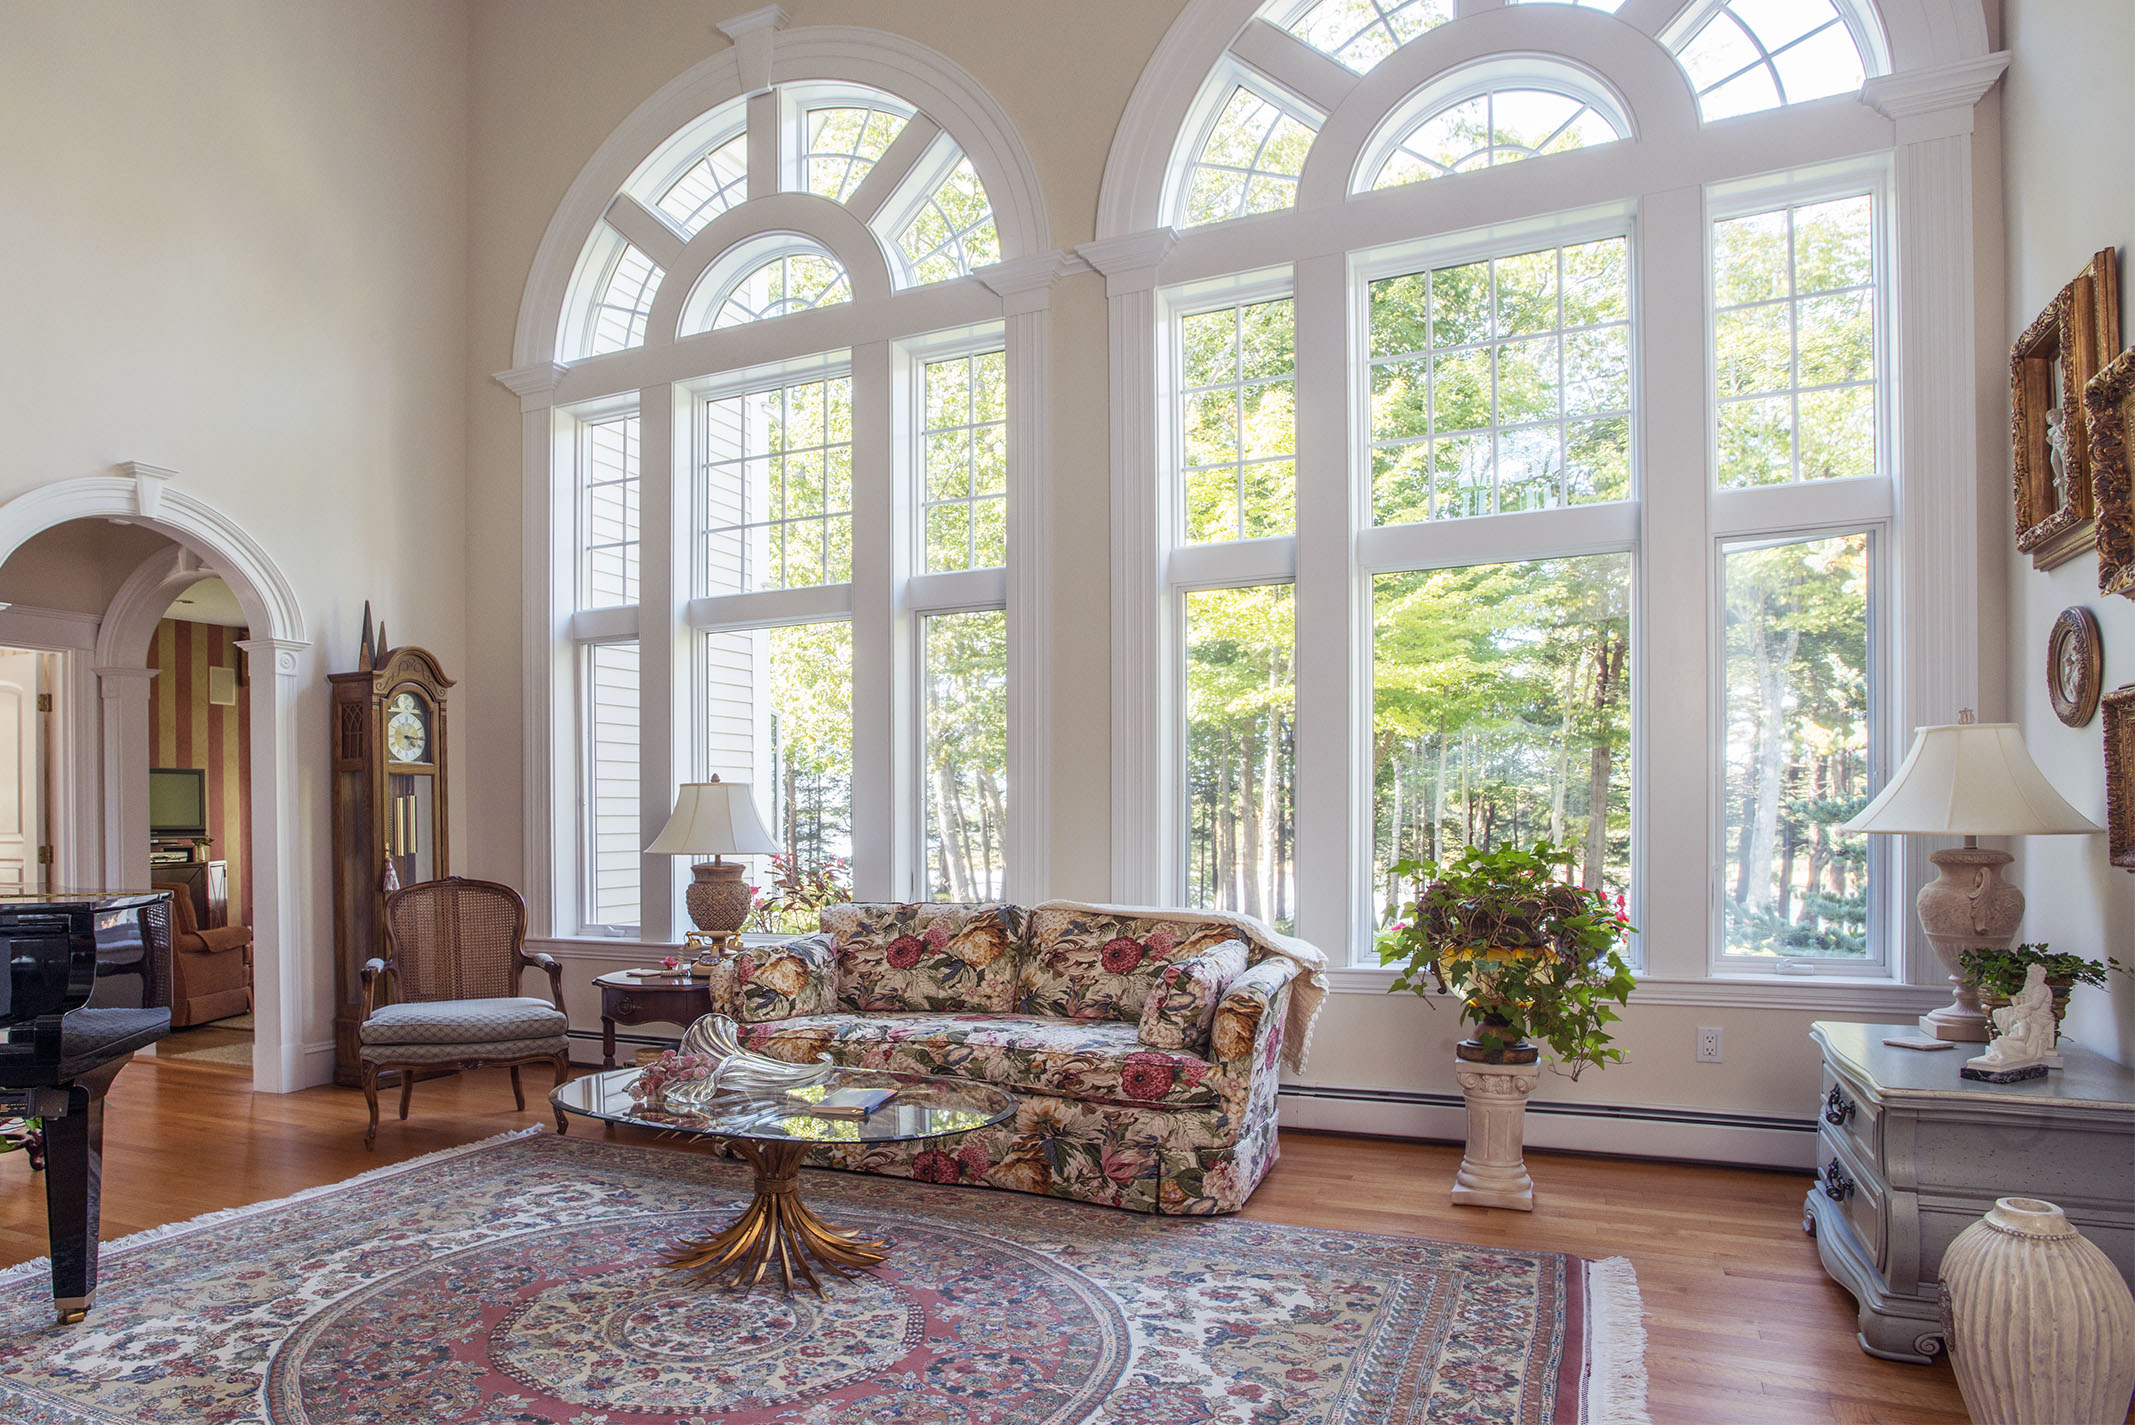 Waltman_Manerio Livingroom 2060.jpg